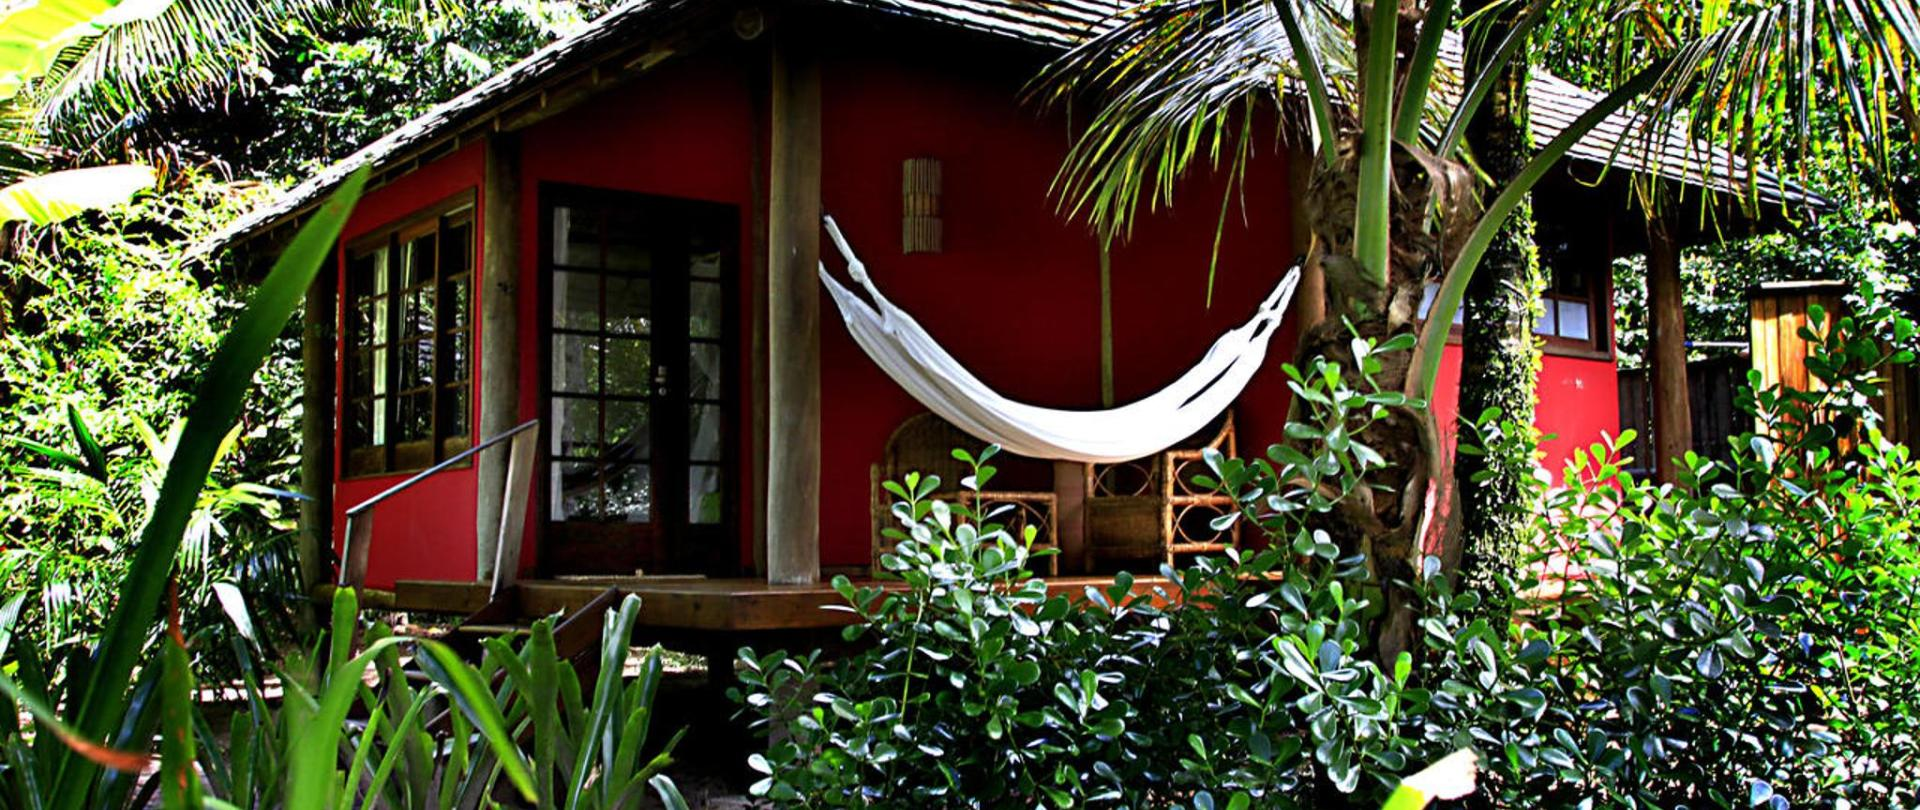 Anima Hotel, Morro de Sao Paulo, Bahia, Nature, Praia Deserta.jpg